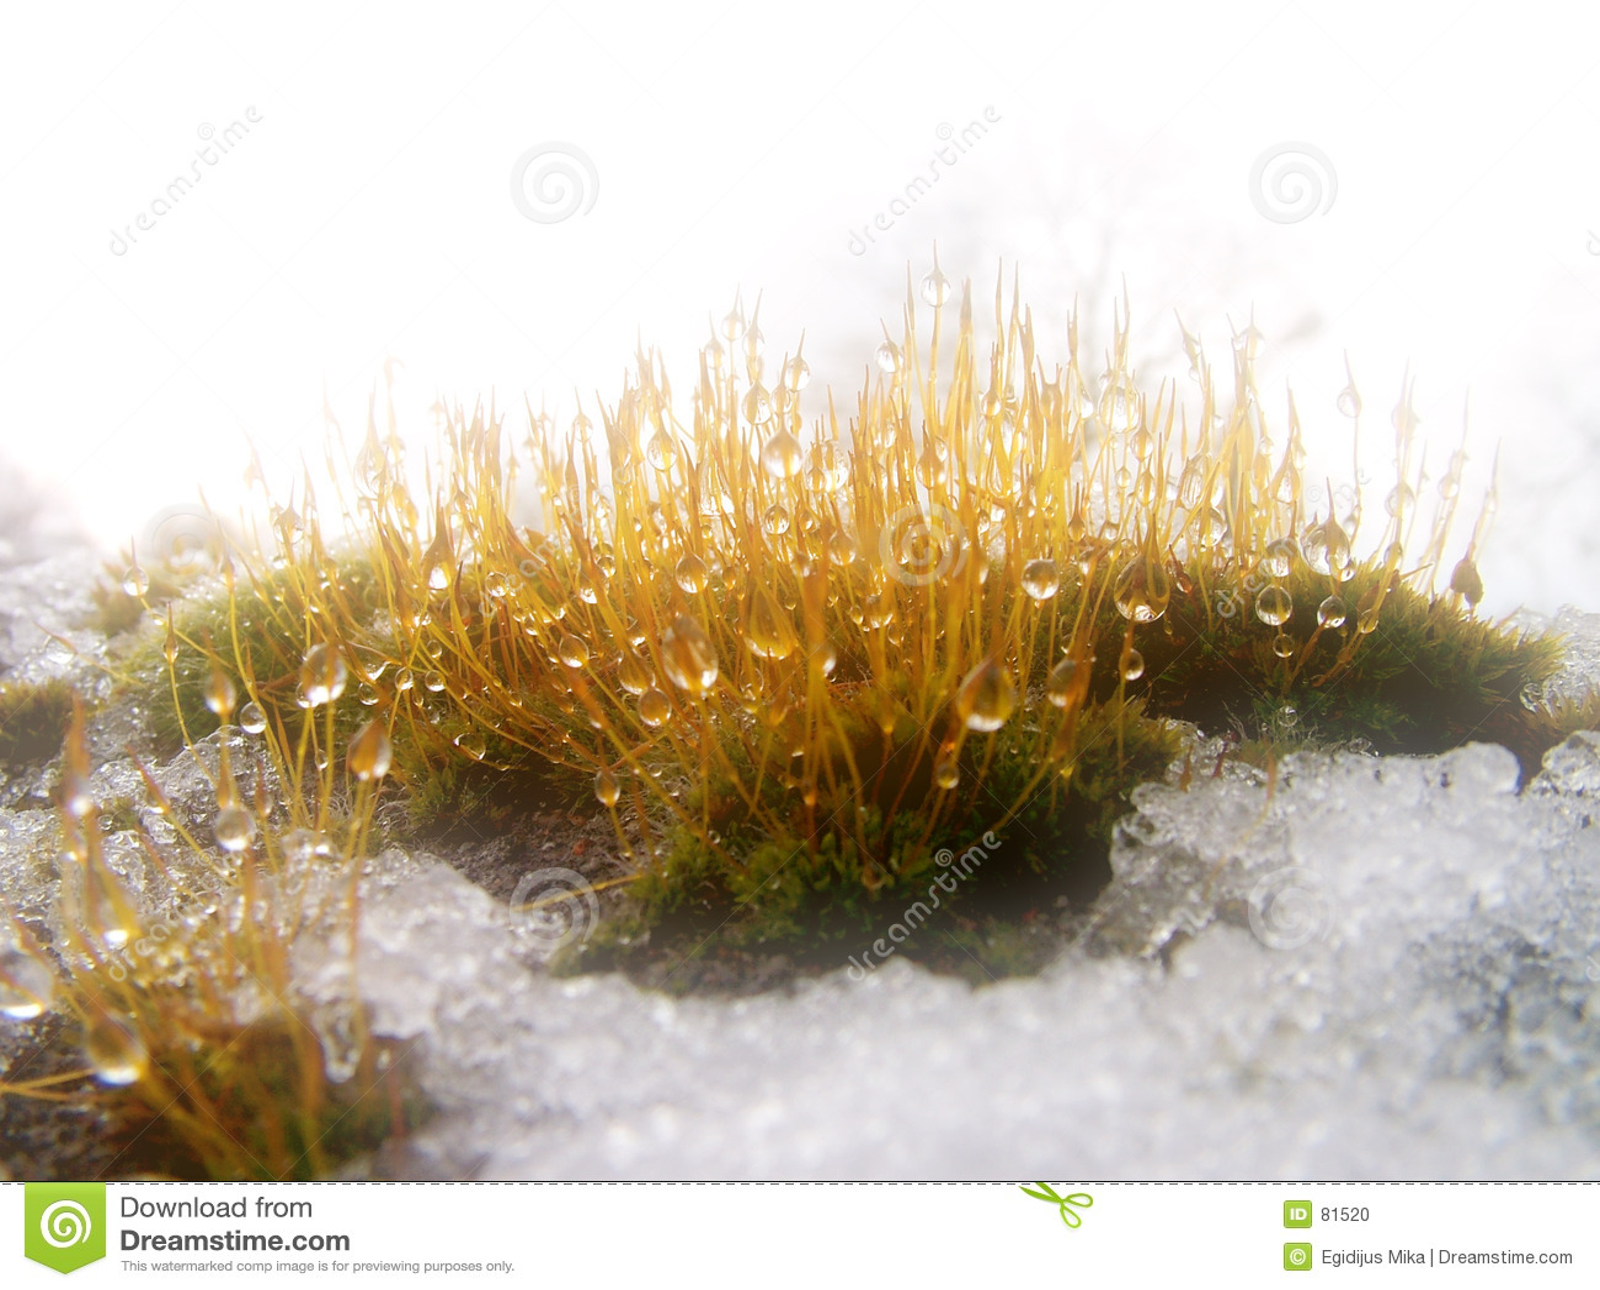 Drop plants snow